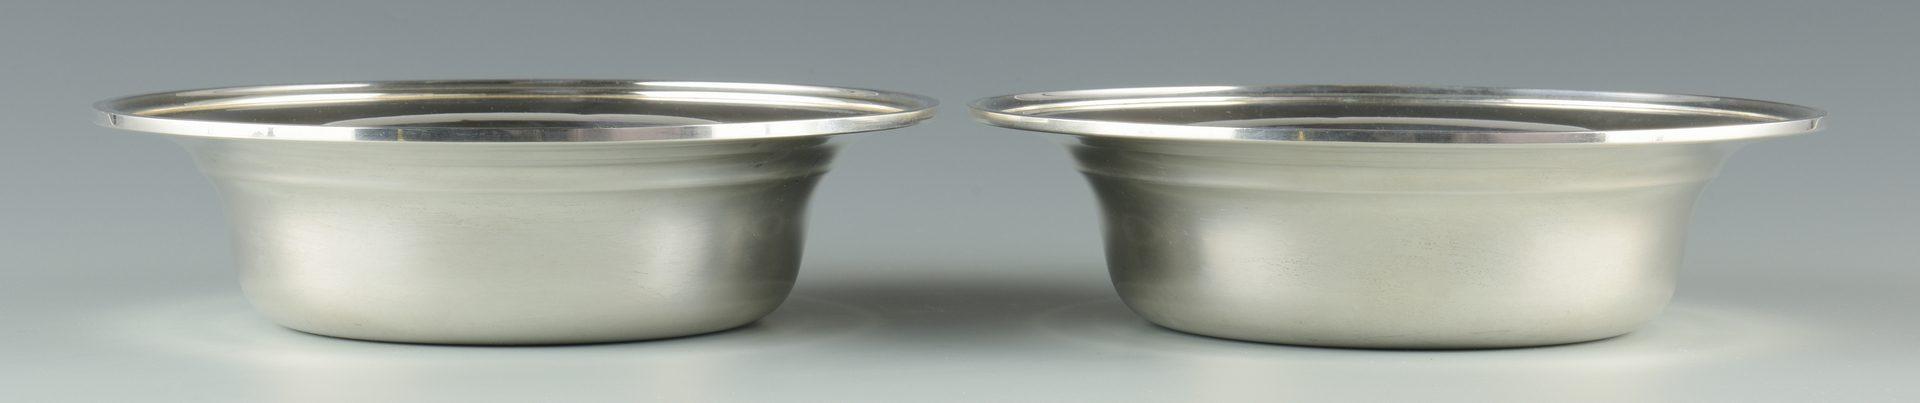 Lot 919: Pair Kirk Sterling Bowls